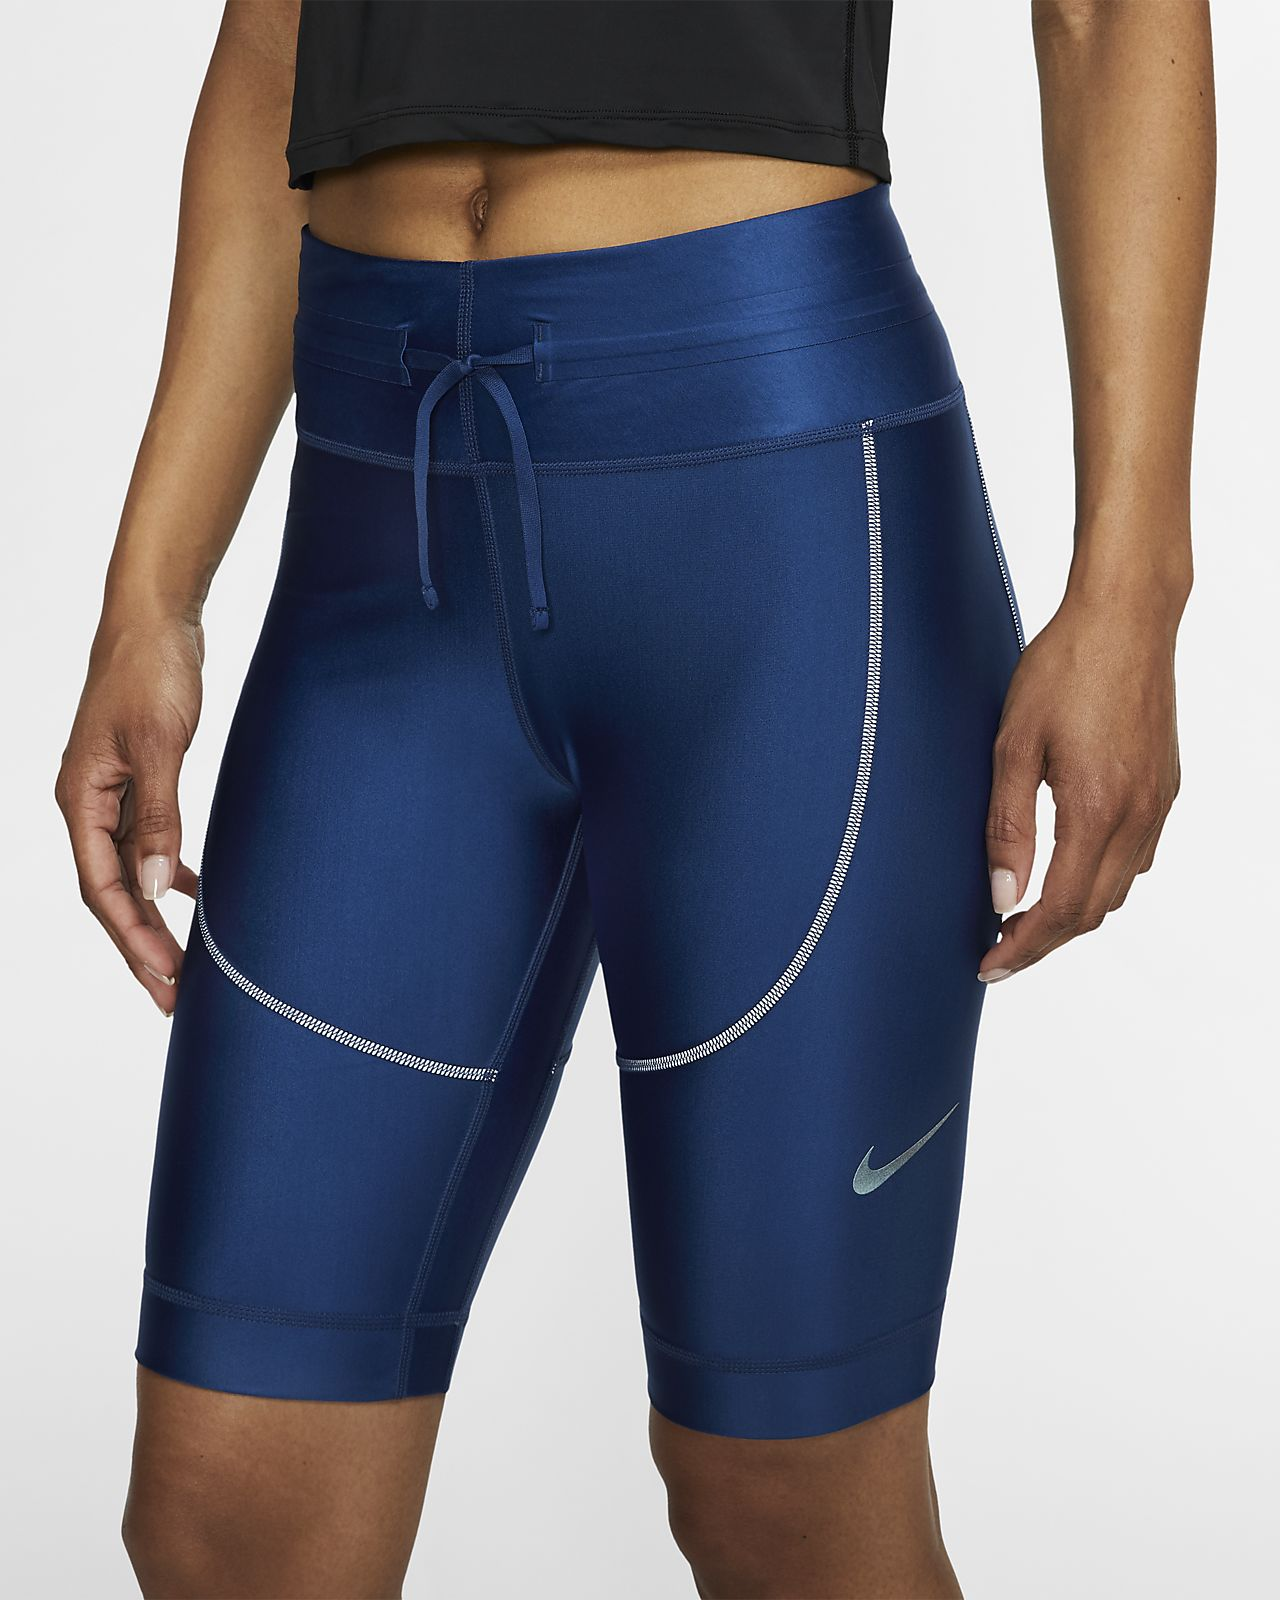 Nike City Ready Hardlooptights voor dames